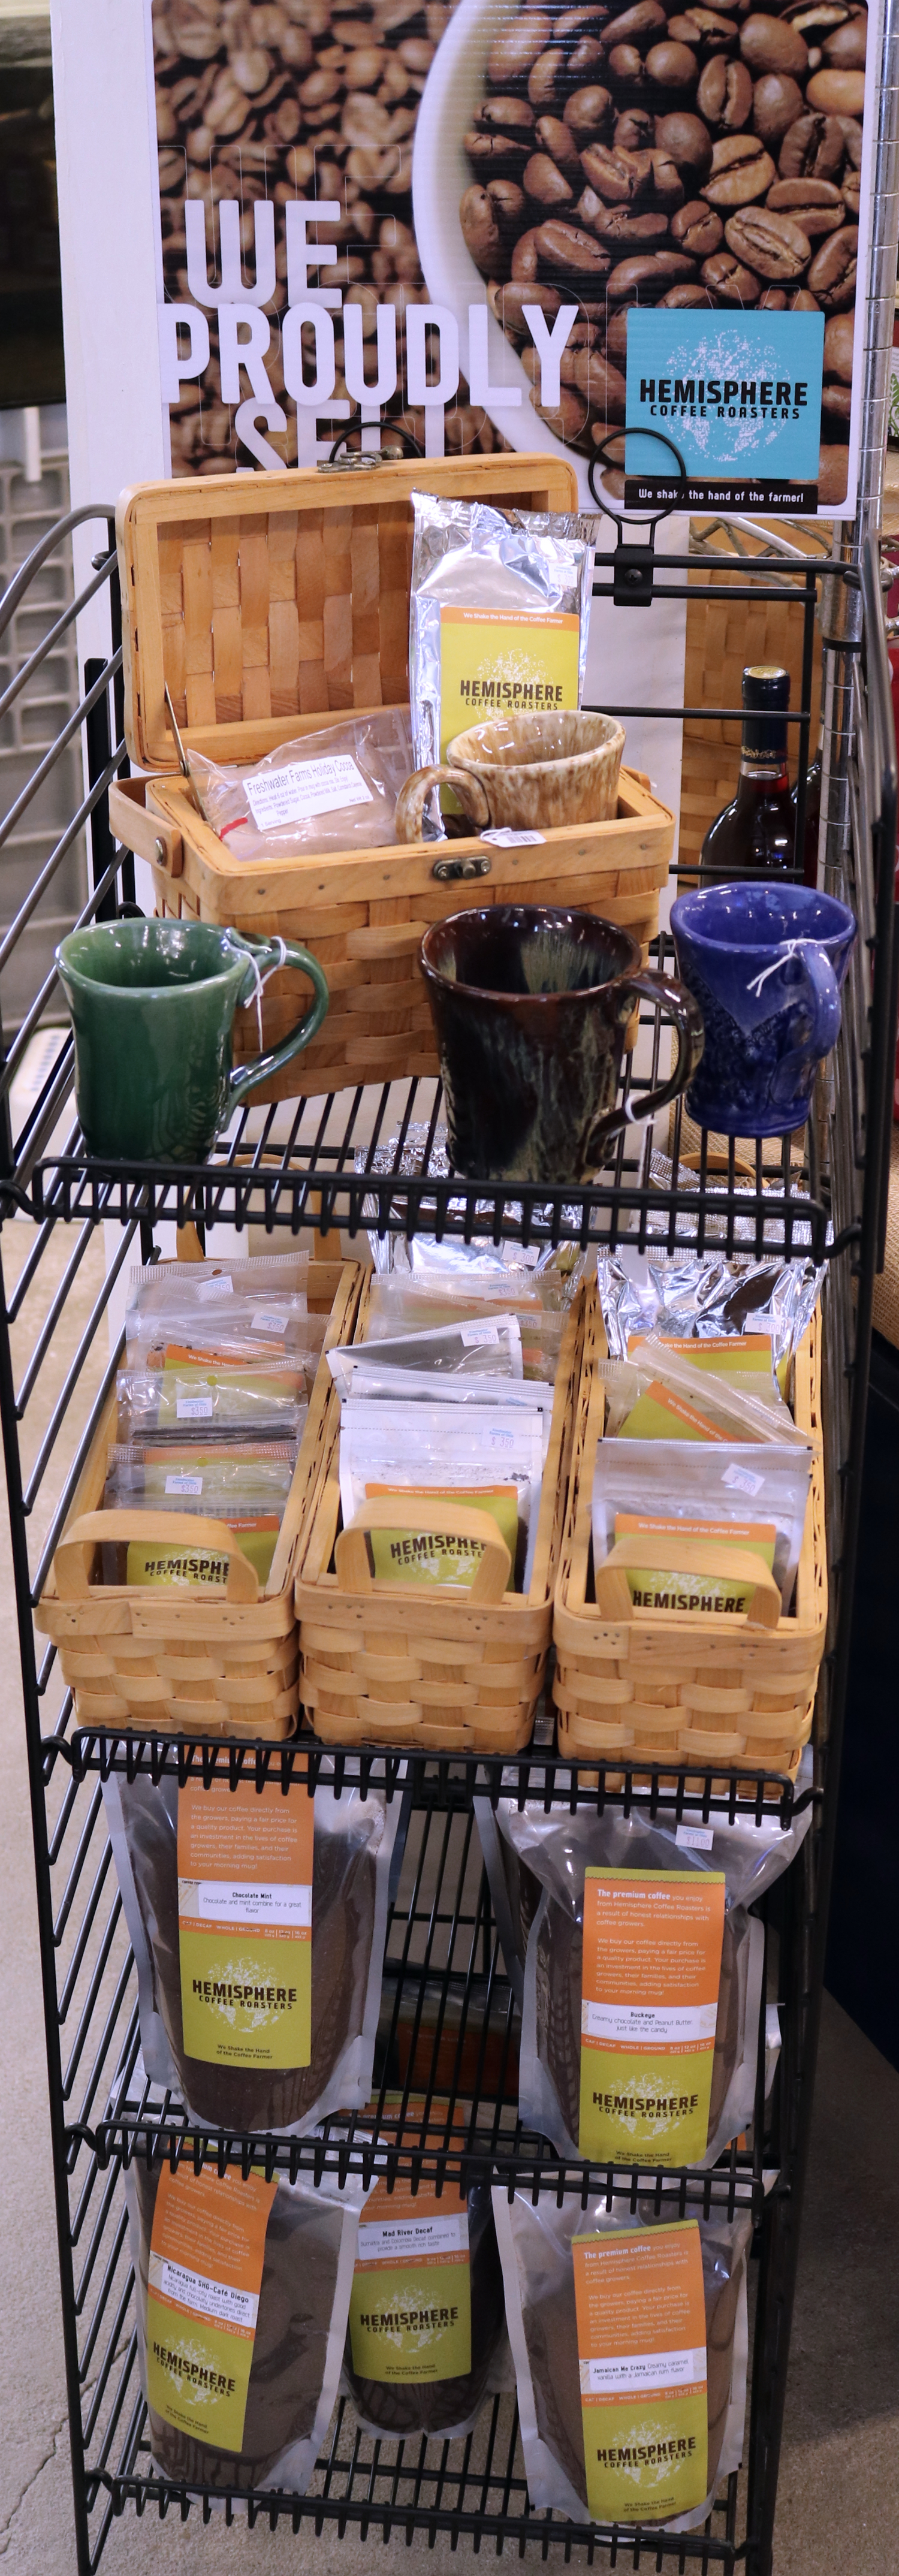 Hemisphere Brand Locally-made Coffee